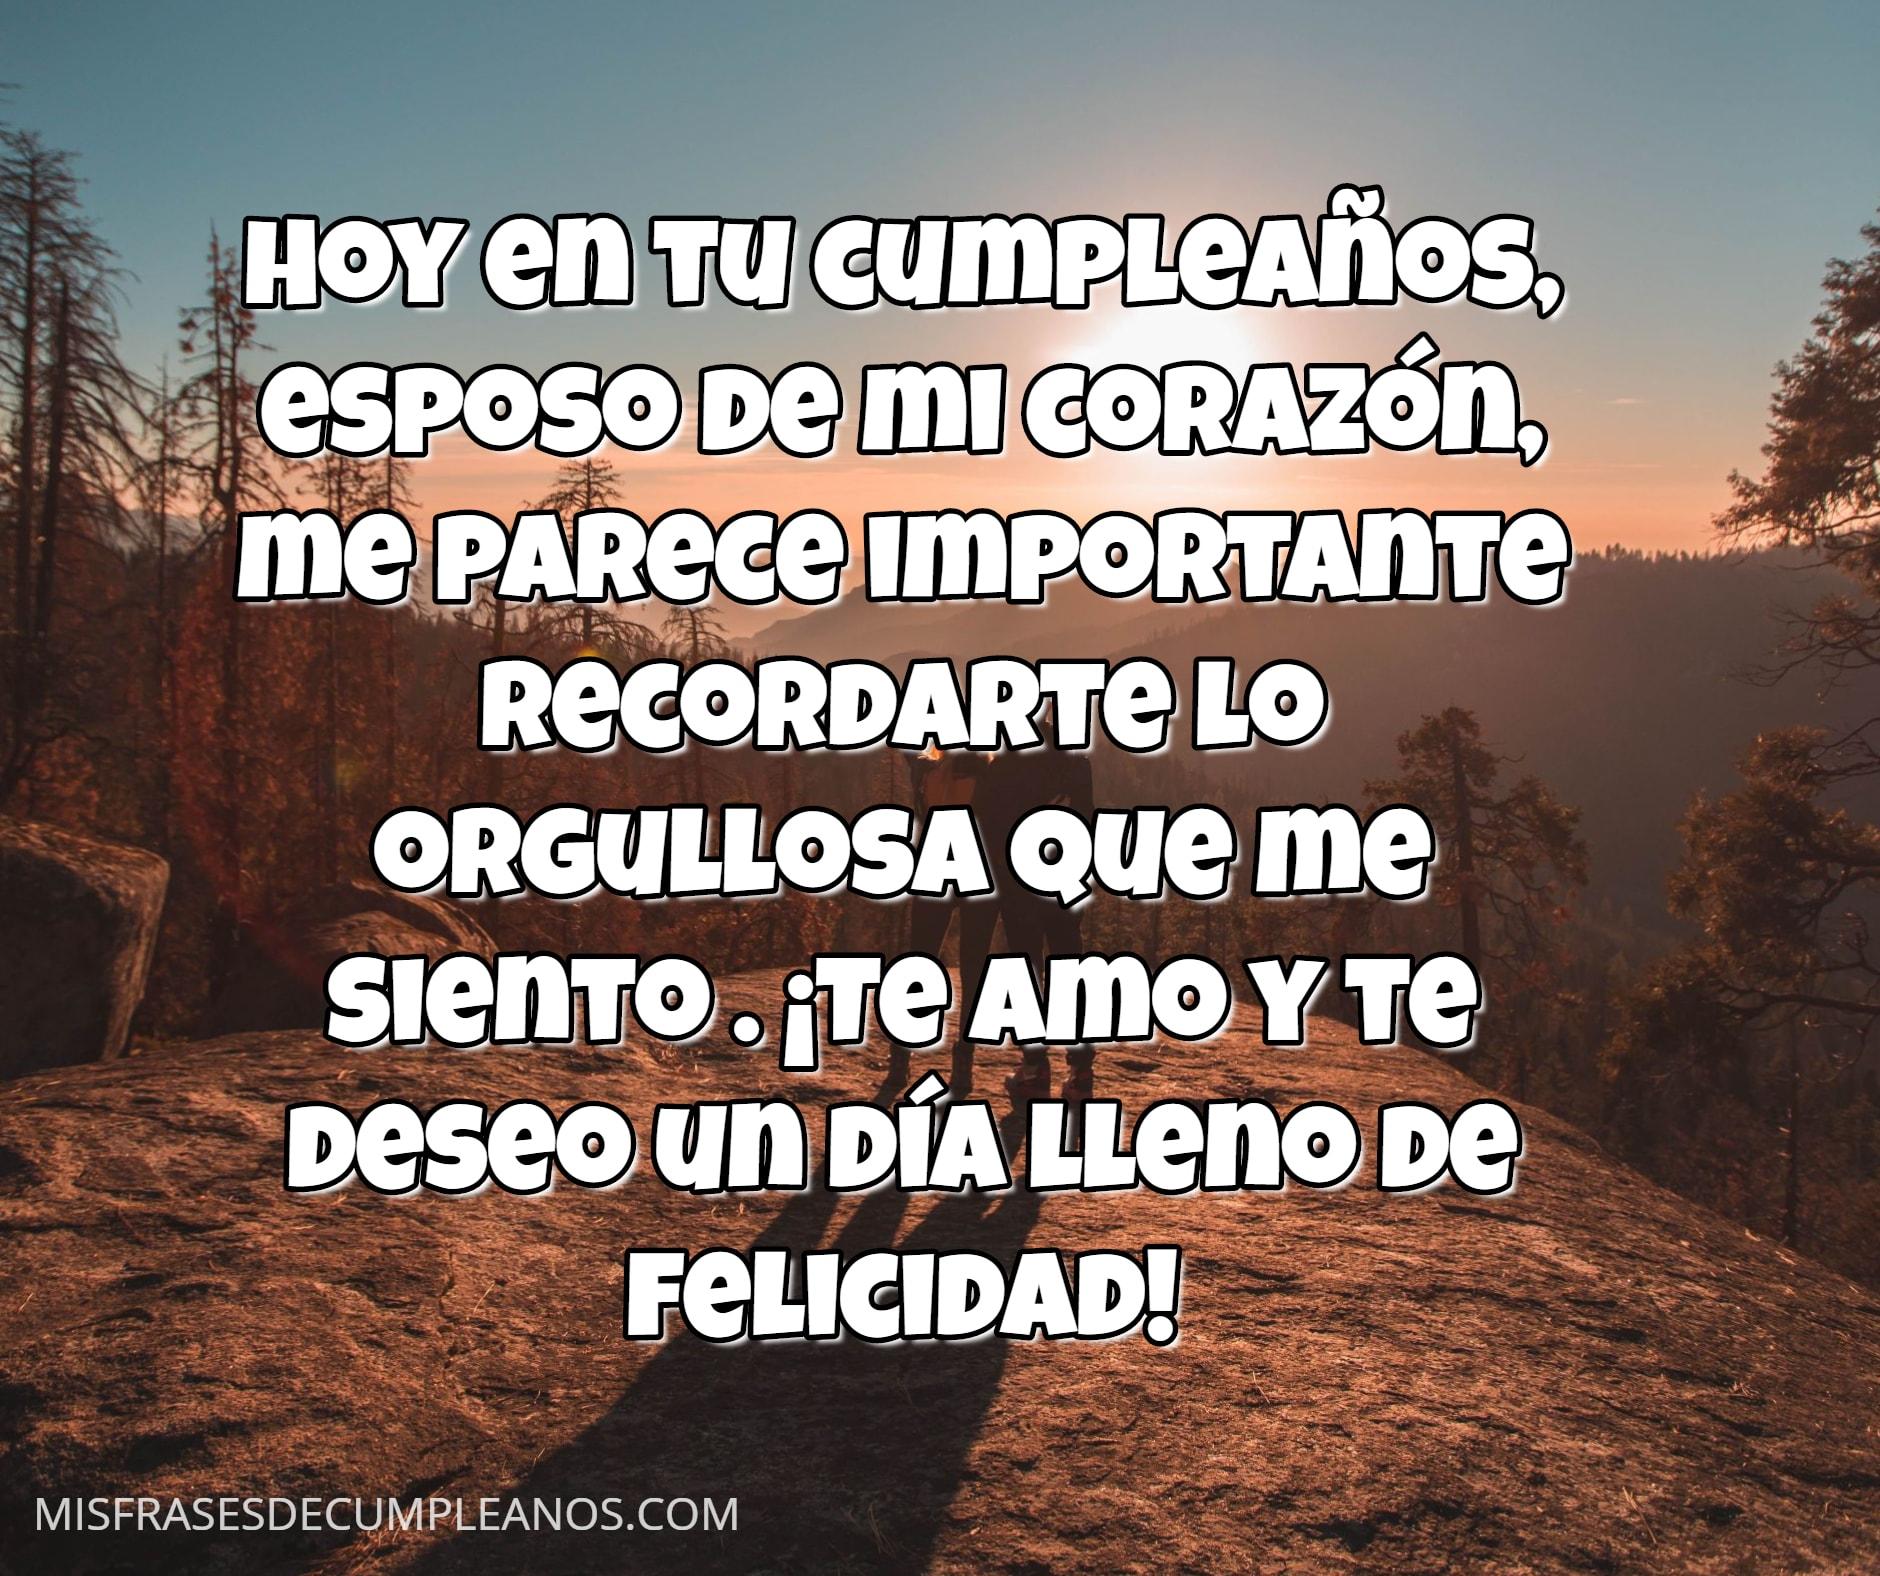 Espero poder celebrar por mucho tiempo contigo